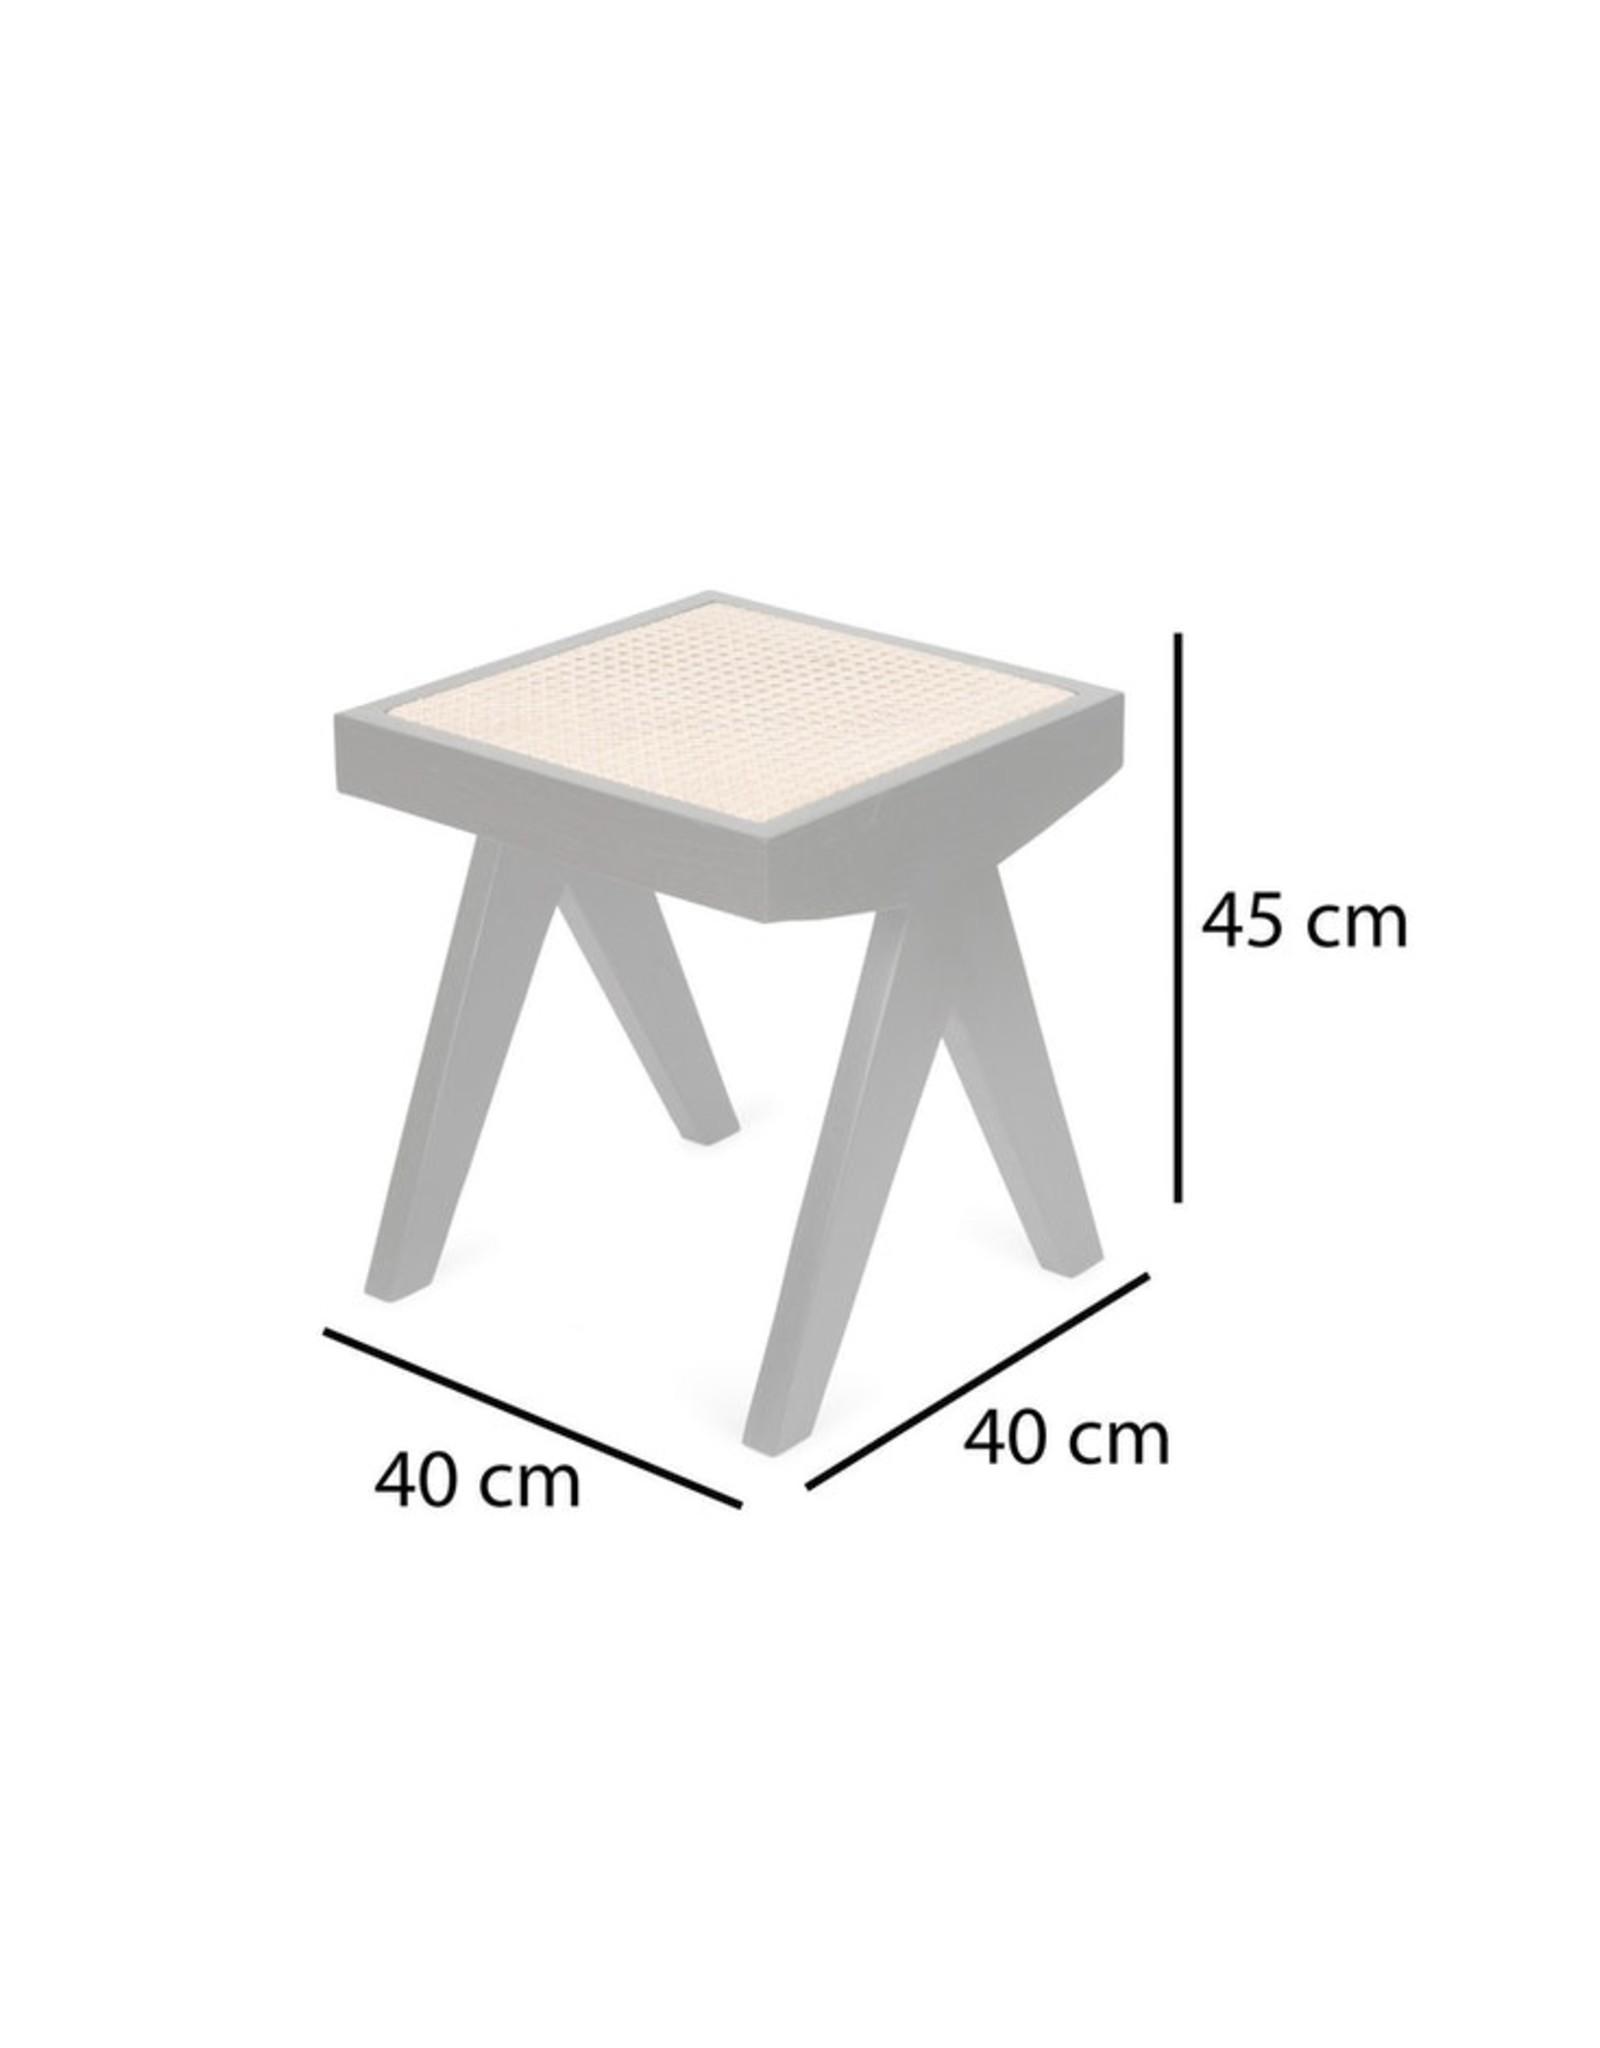 Detjer Bench / B.T.H. Flats 1 - Donkerbruin